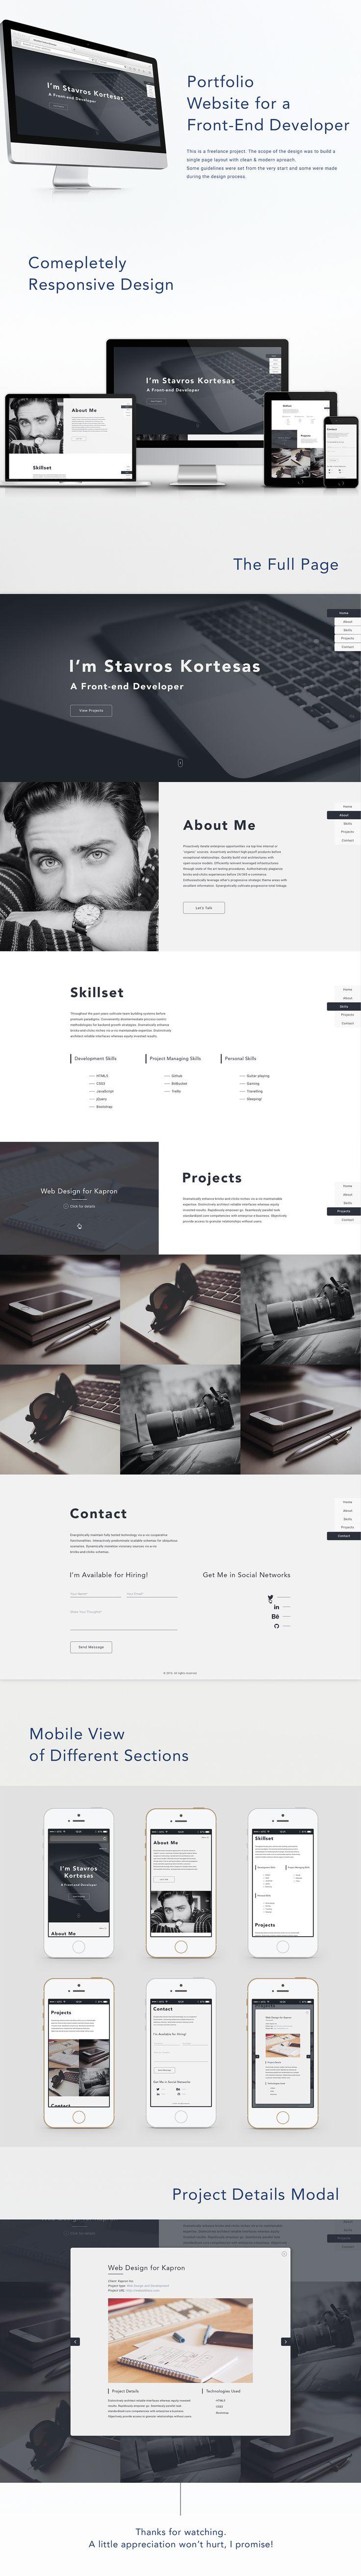 One-Page Portfolio Website for a Front-end Developer on Behance